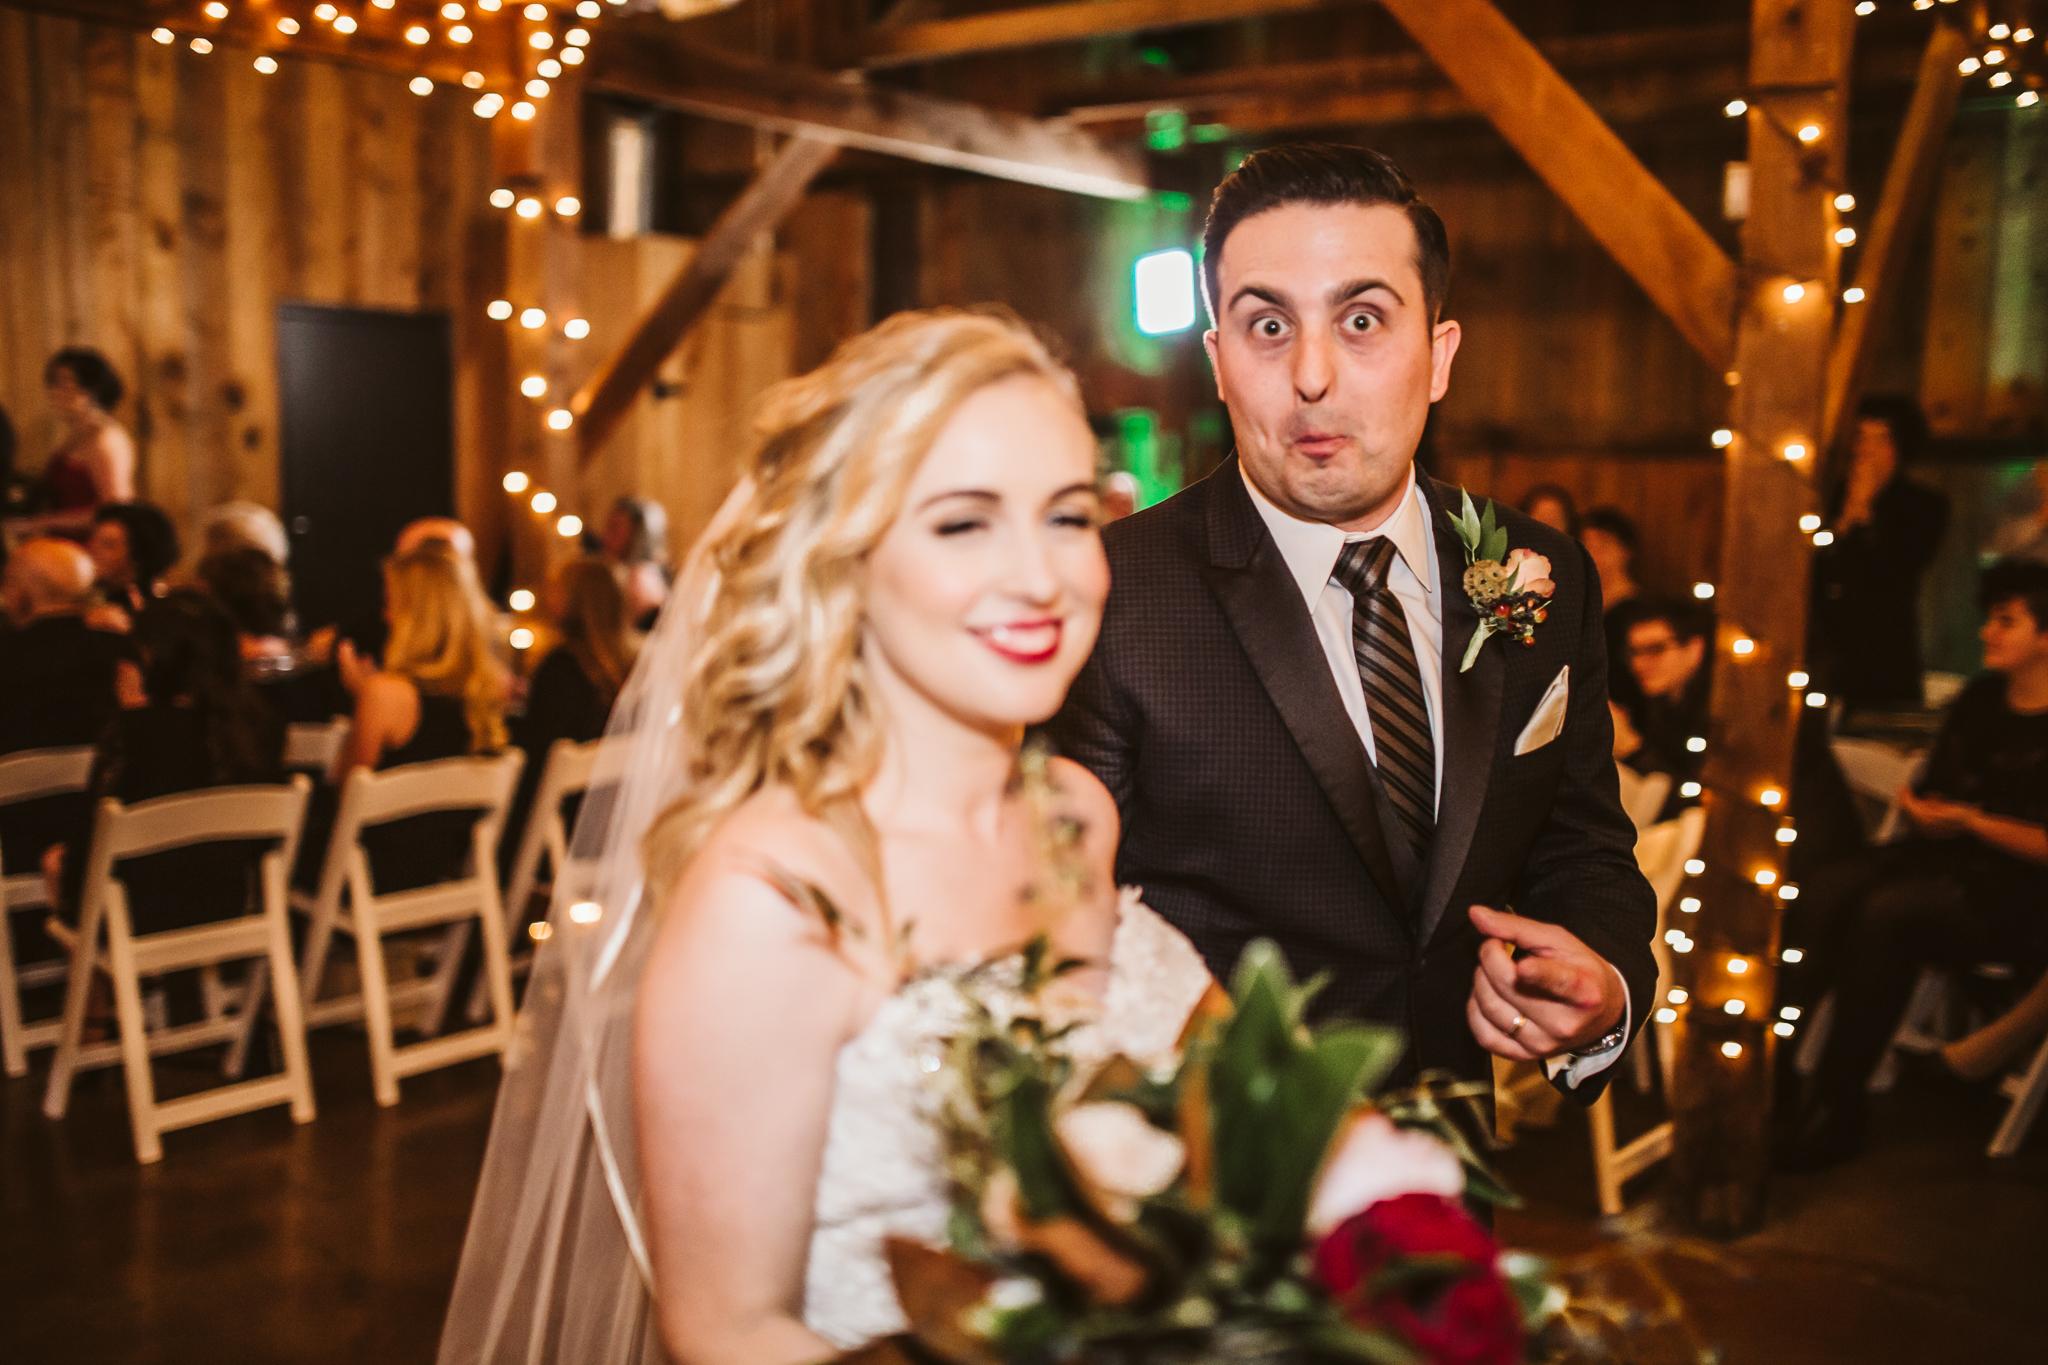 0126 Ariana Jordan Photo - Cameron & Lauren's Wedding at Talon Winery  7115.jpg